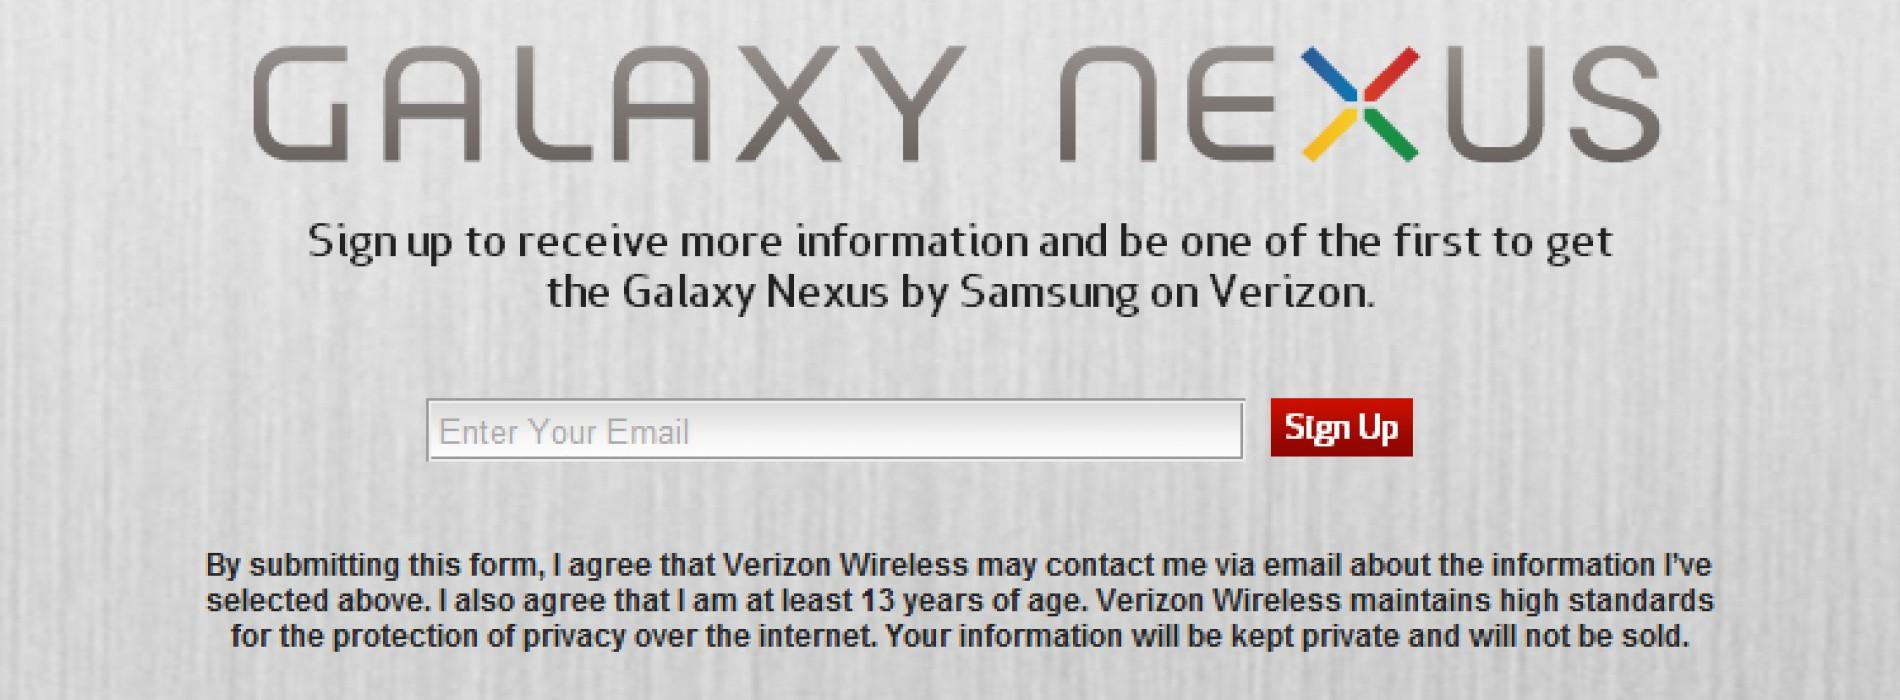 Verizon's Galaxy Nexus sign-up page goes live